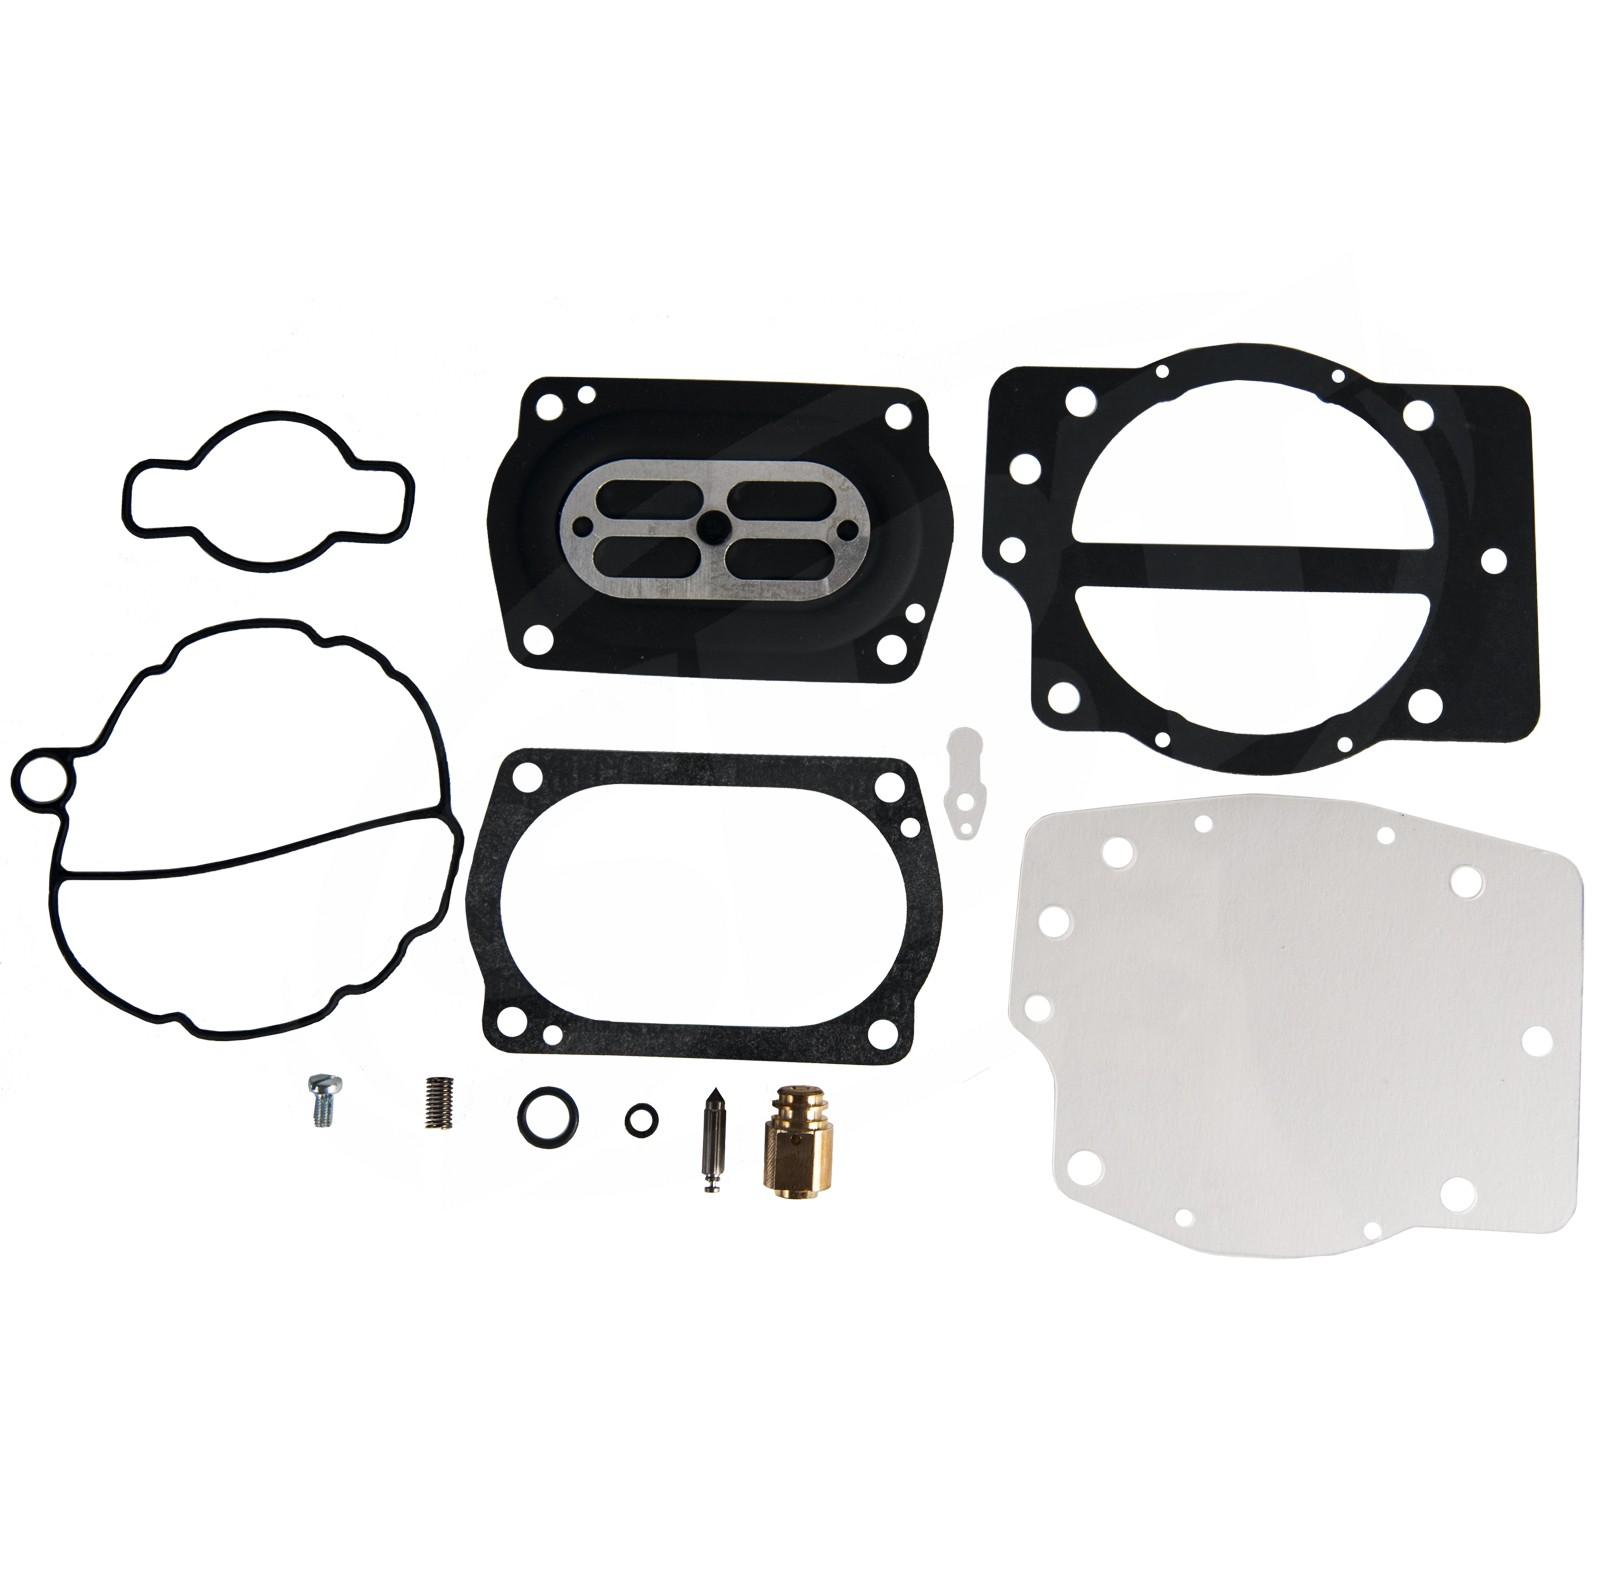 Kit Gasket Carburetor, kawasaki